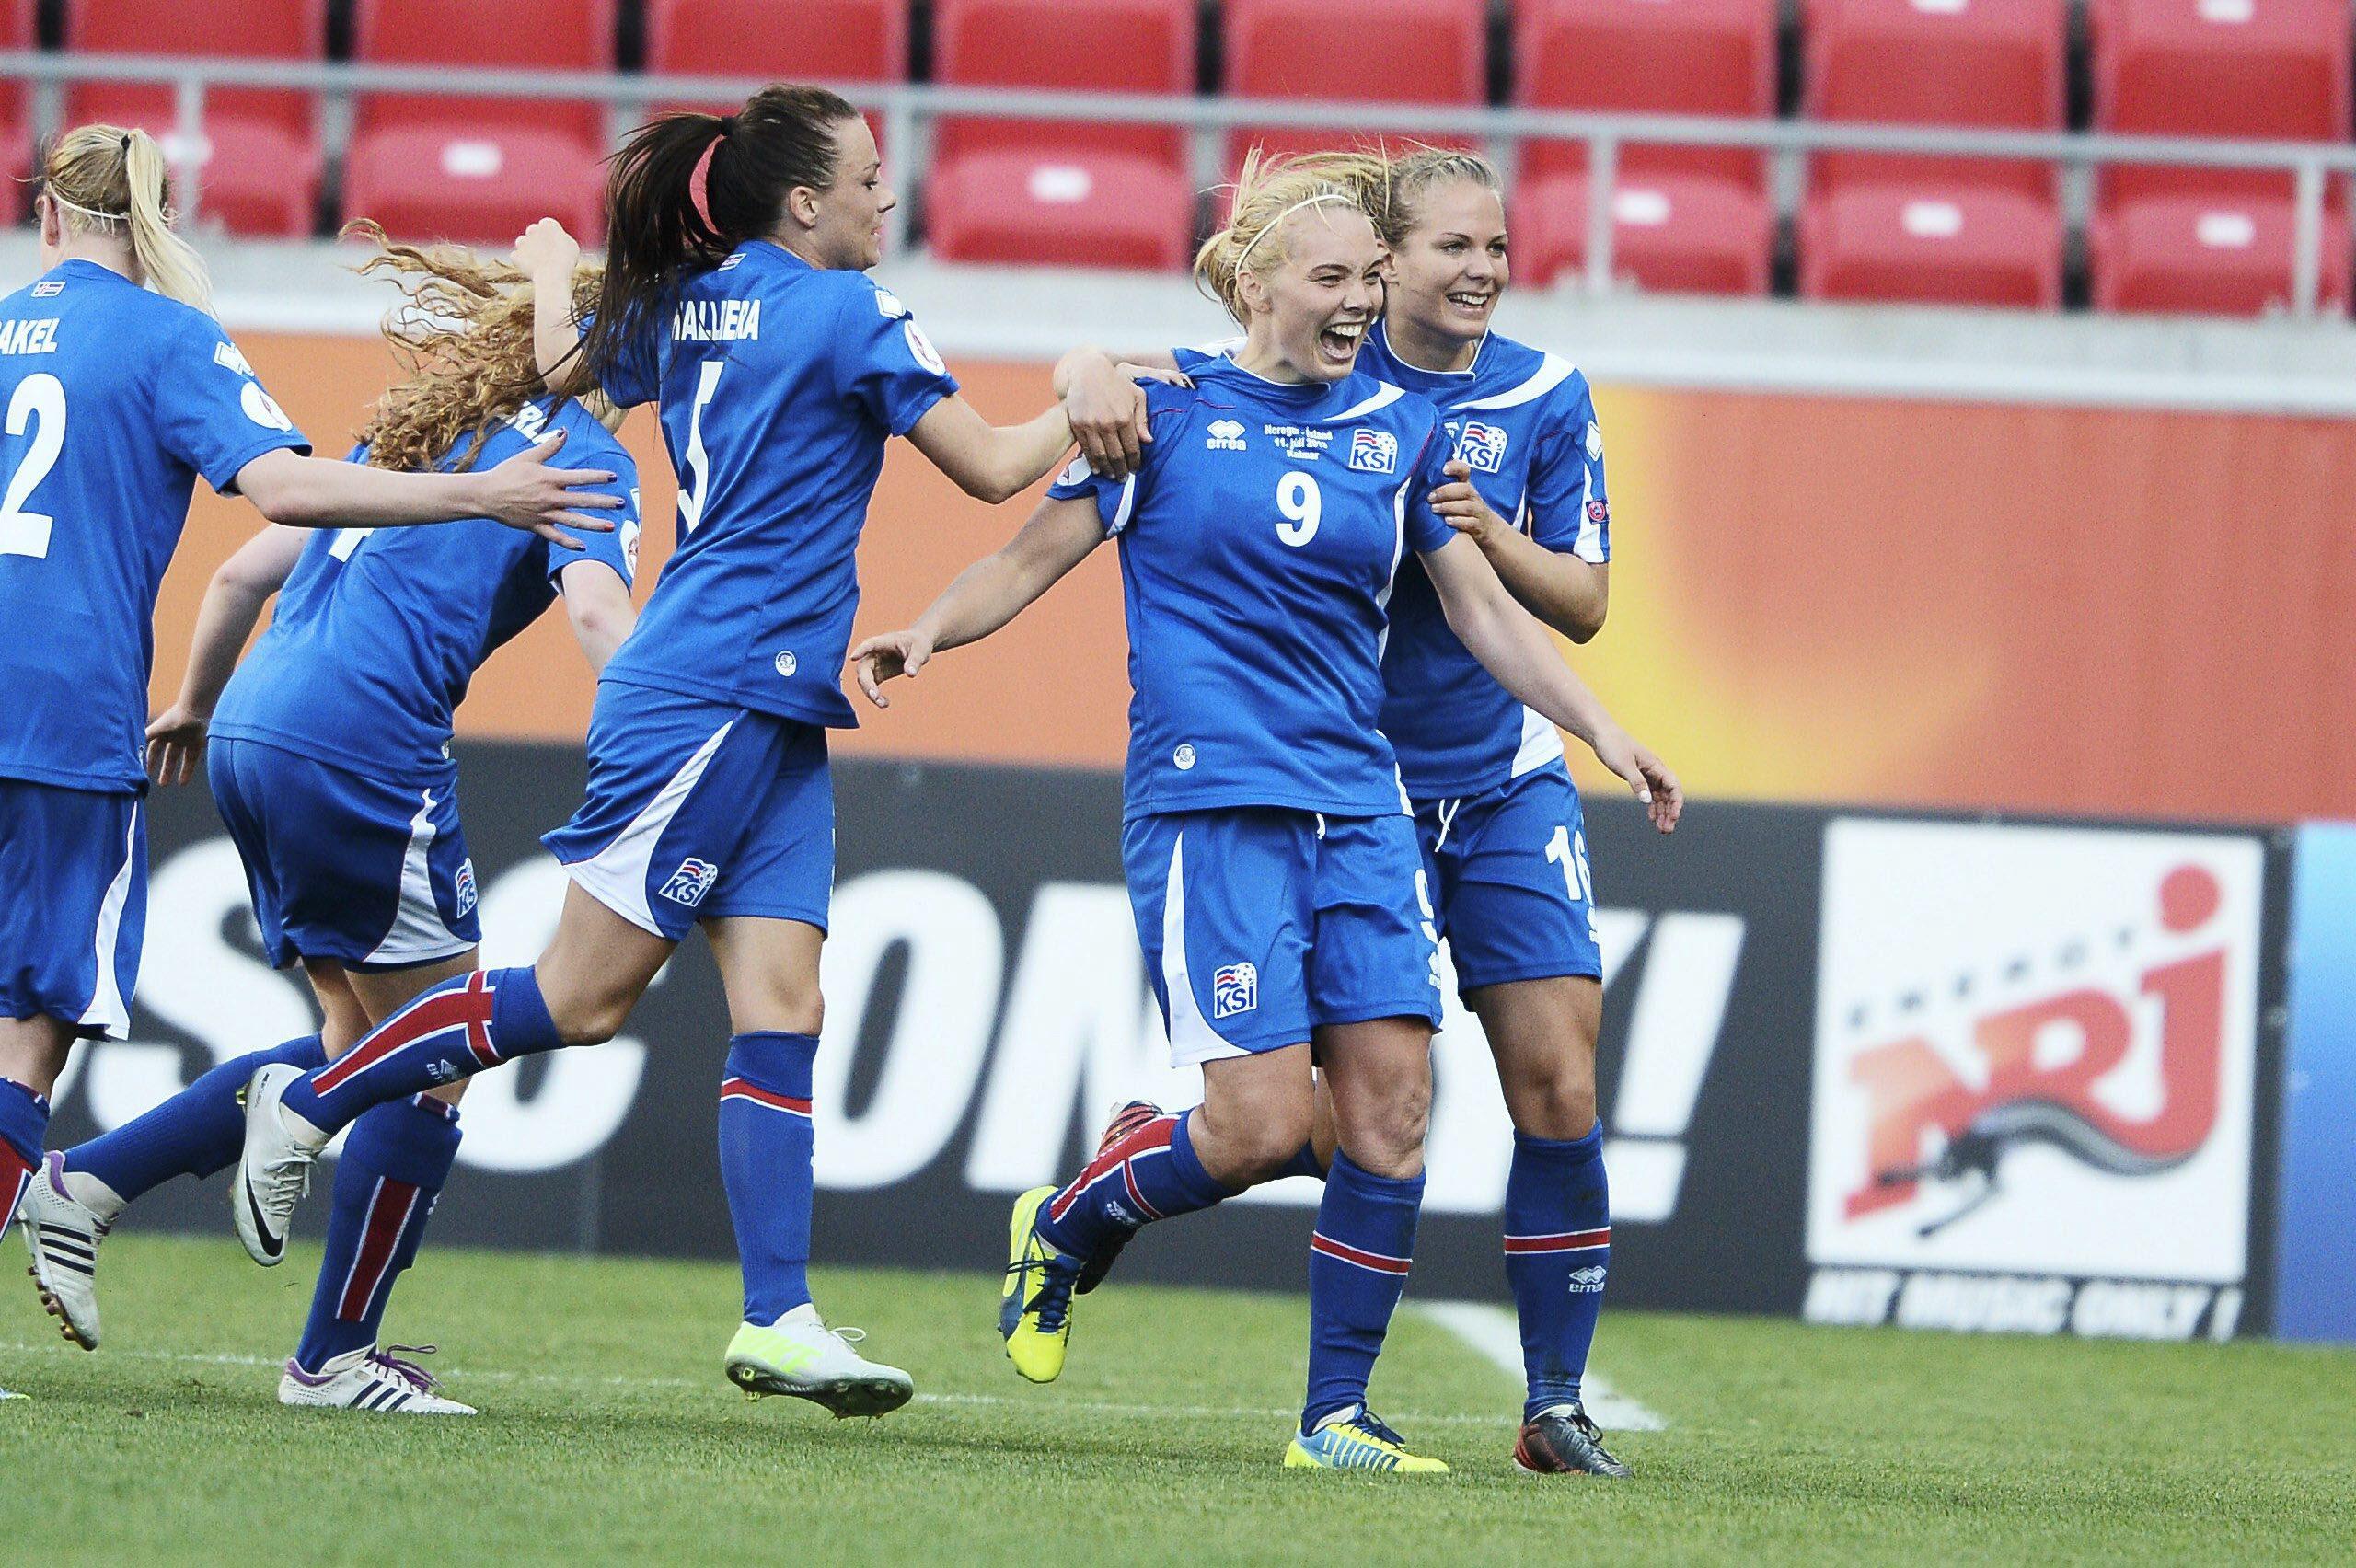 Iceland's Margret Lera Vidarsdettir, (2ndR), jubilates after scoring a penalty kick during the UEFA Women's European Championship Euro 2013 football match bewteen Norway and Iceland in Kalmar, Sweden, on July 11, 2013. AFP PHOTO /SCANPIX SWEDEN/ PATRIC SODERSTROM /SWEDEN OUT / AFP PHOTO / SCANPIX SWEDEN / PATRIC SODERSTROM